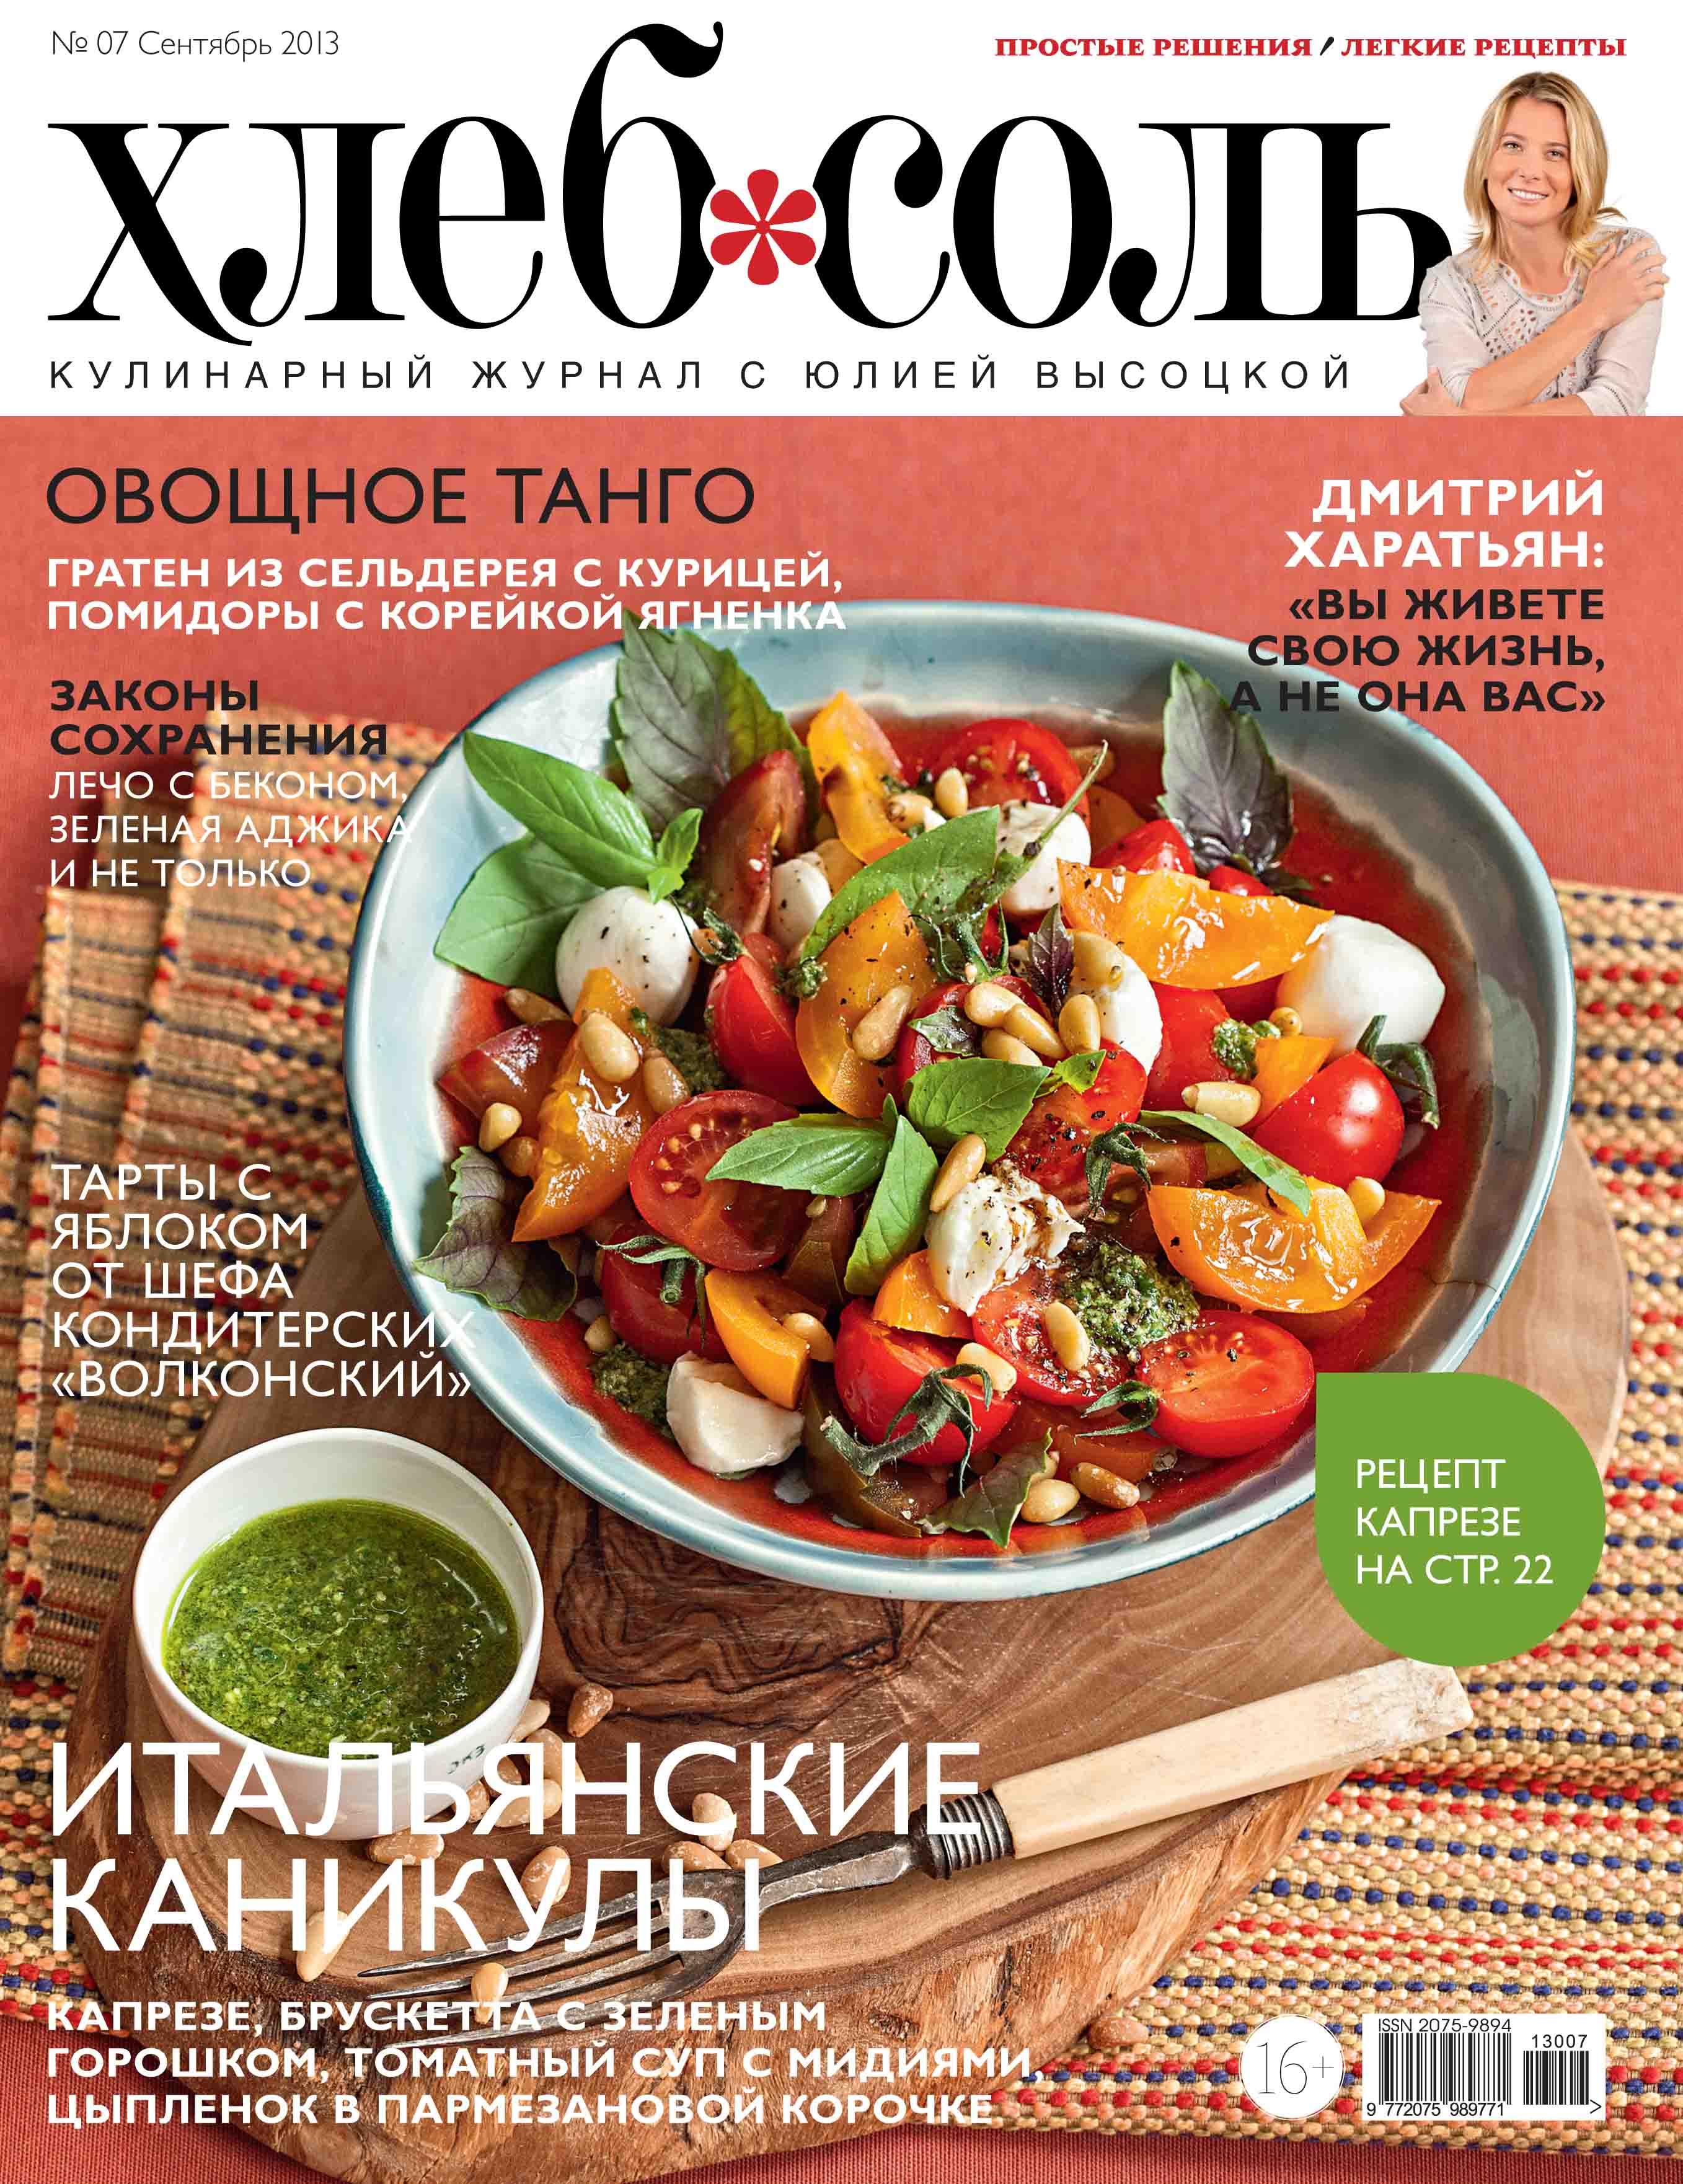 ХлебСоль, № 7, сентябрь 2013